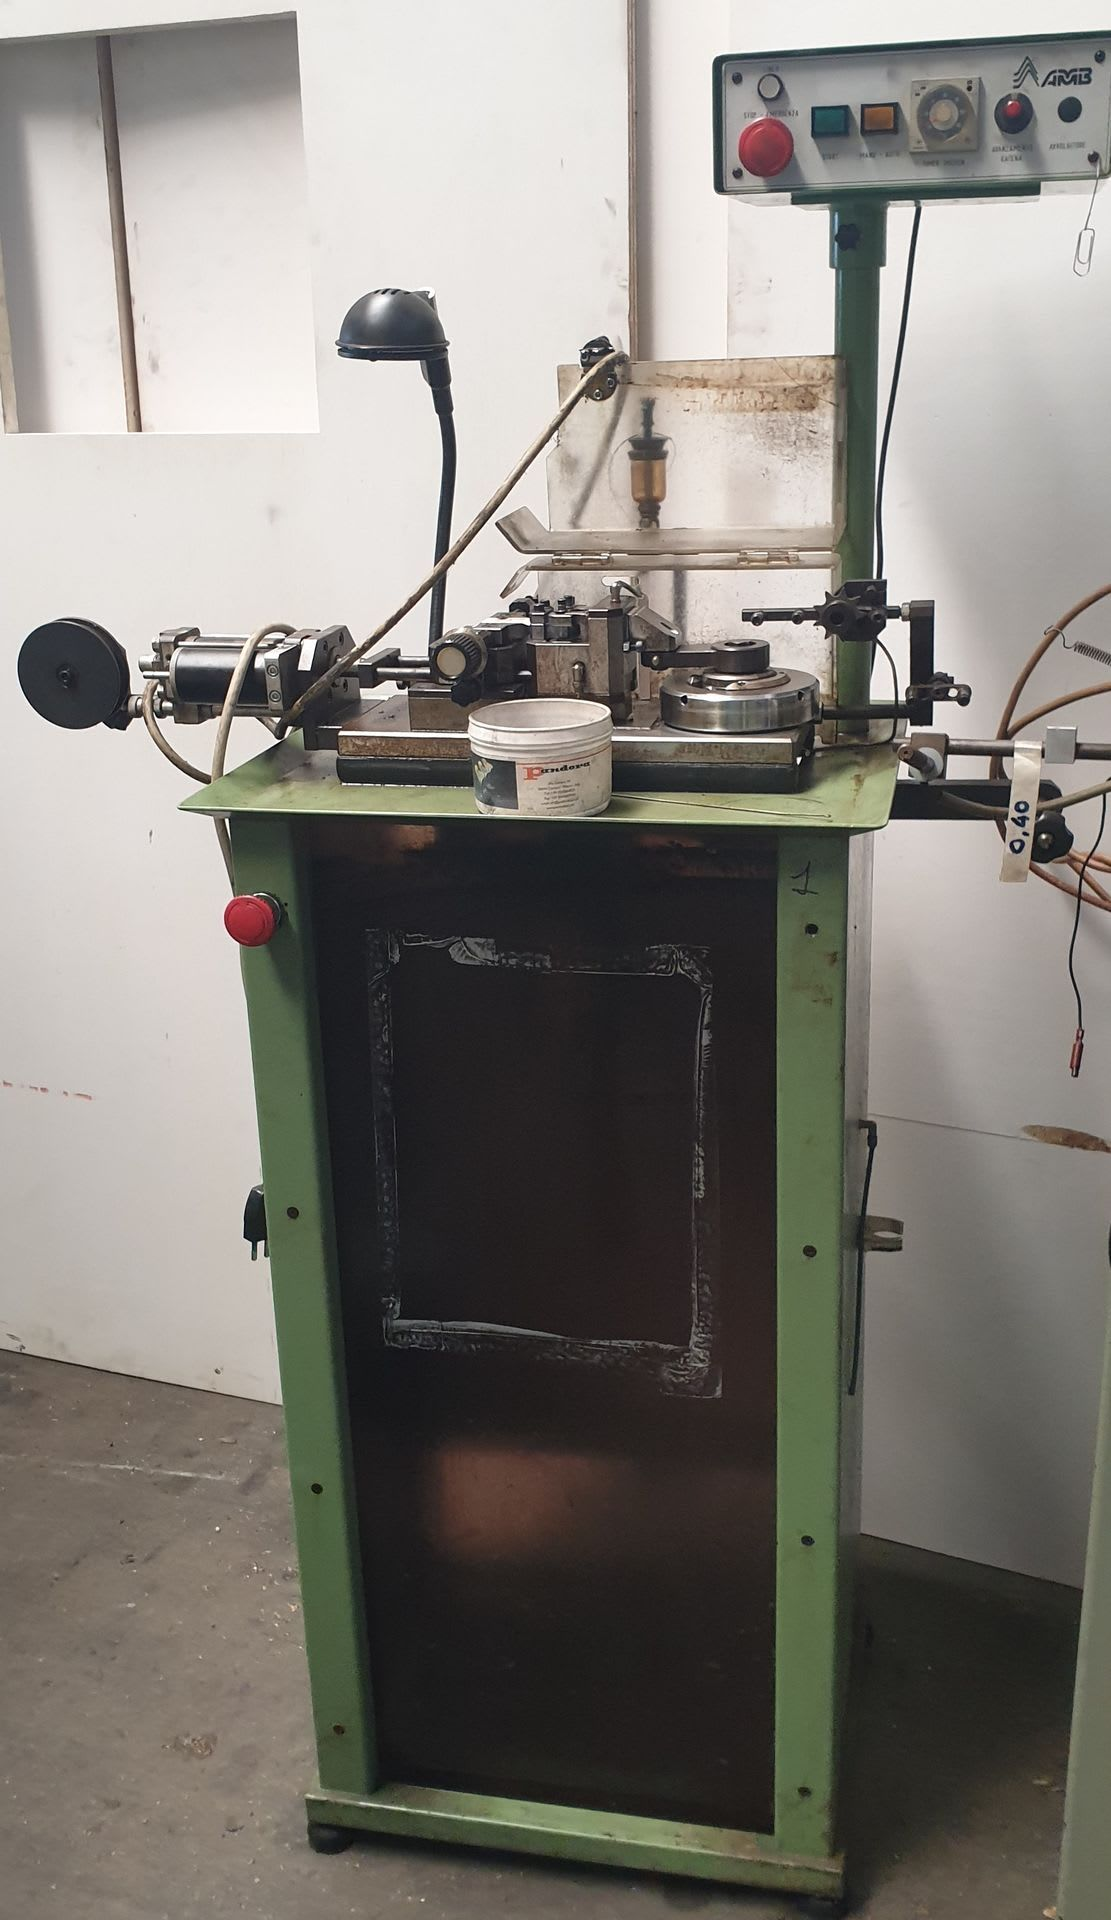 AMB ATSP 103/91 Kettenverdichtungsmaschine